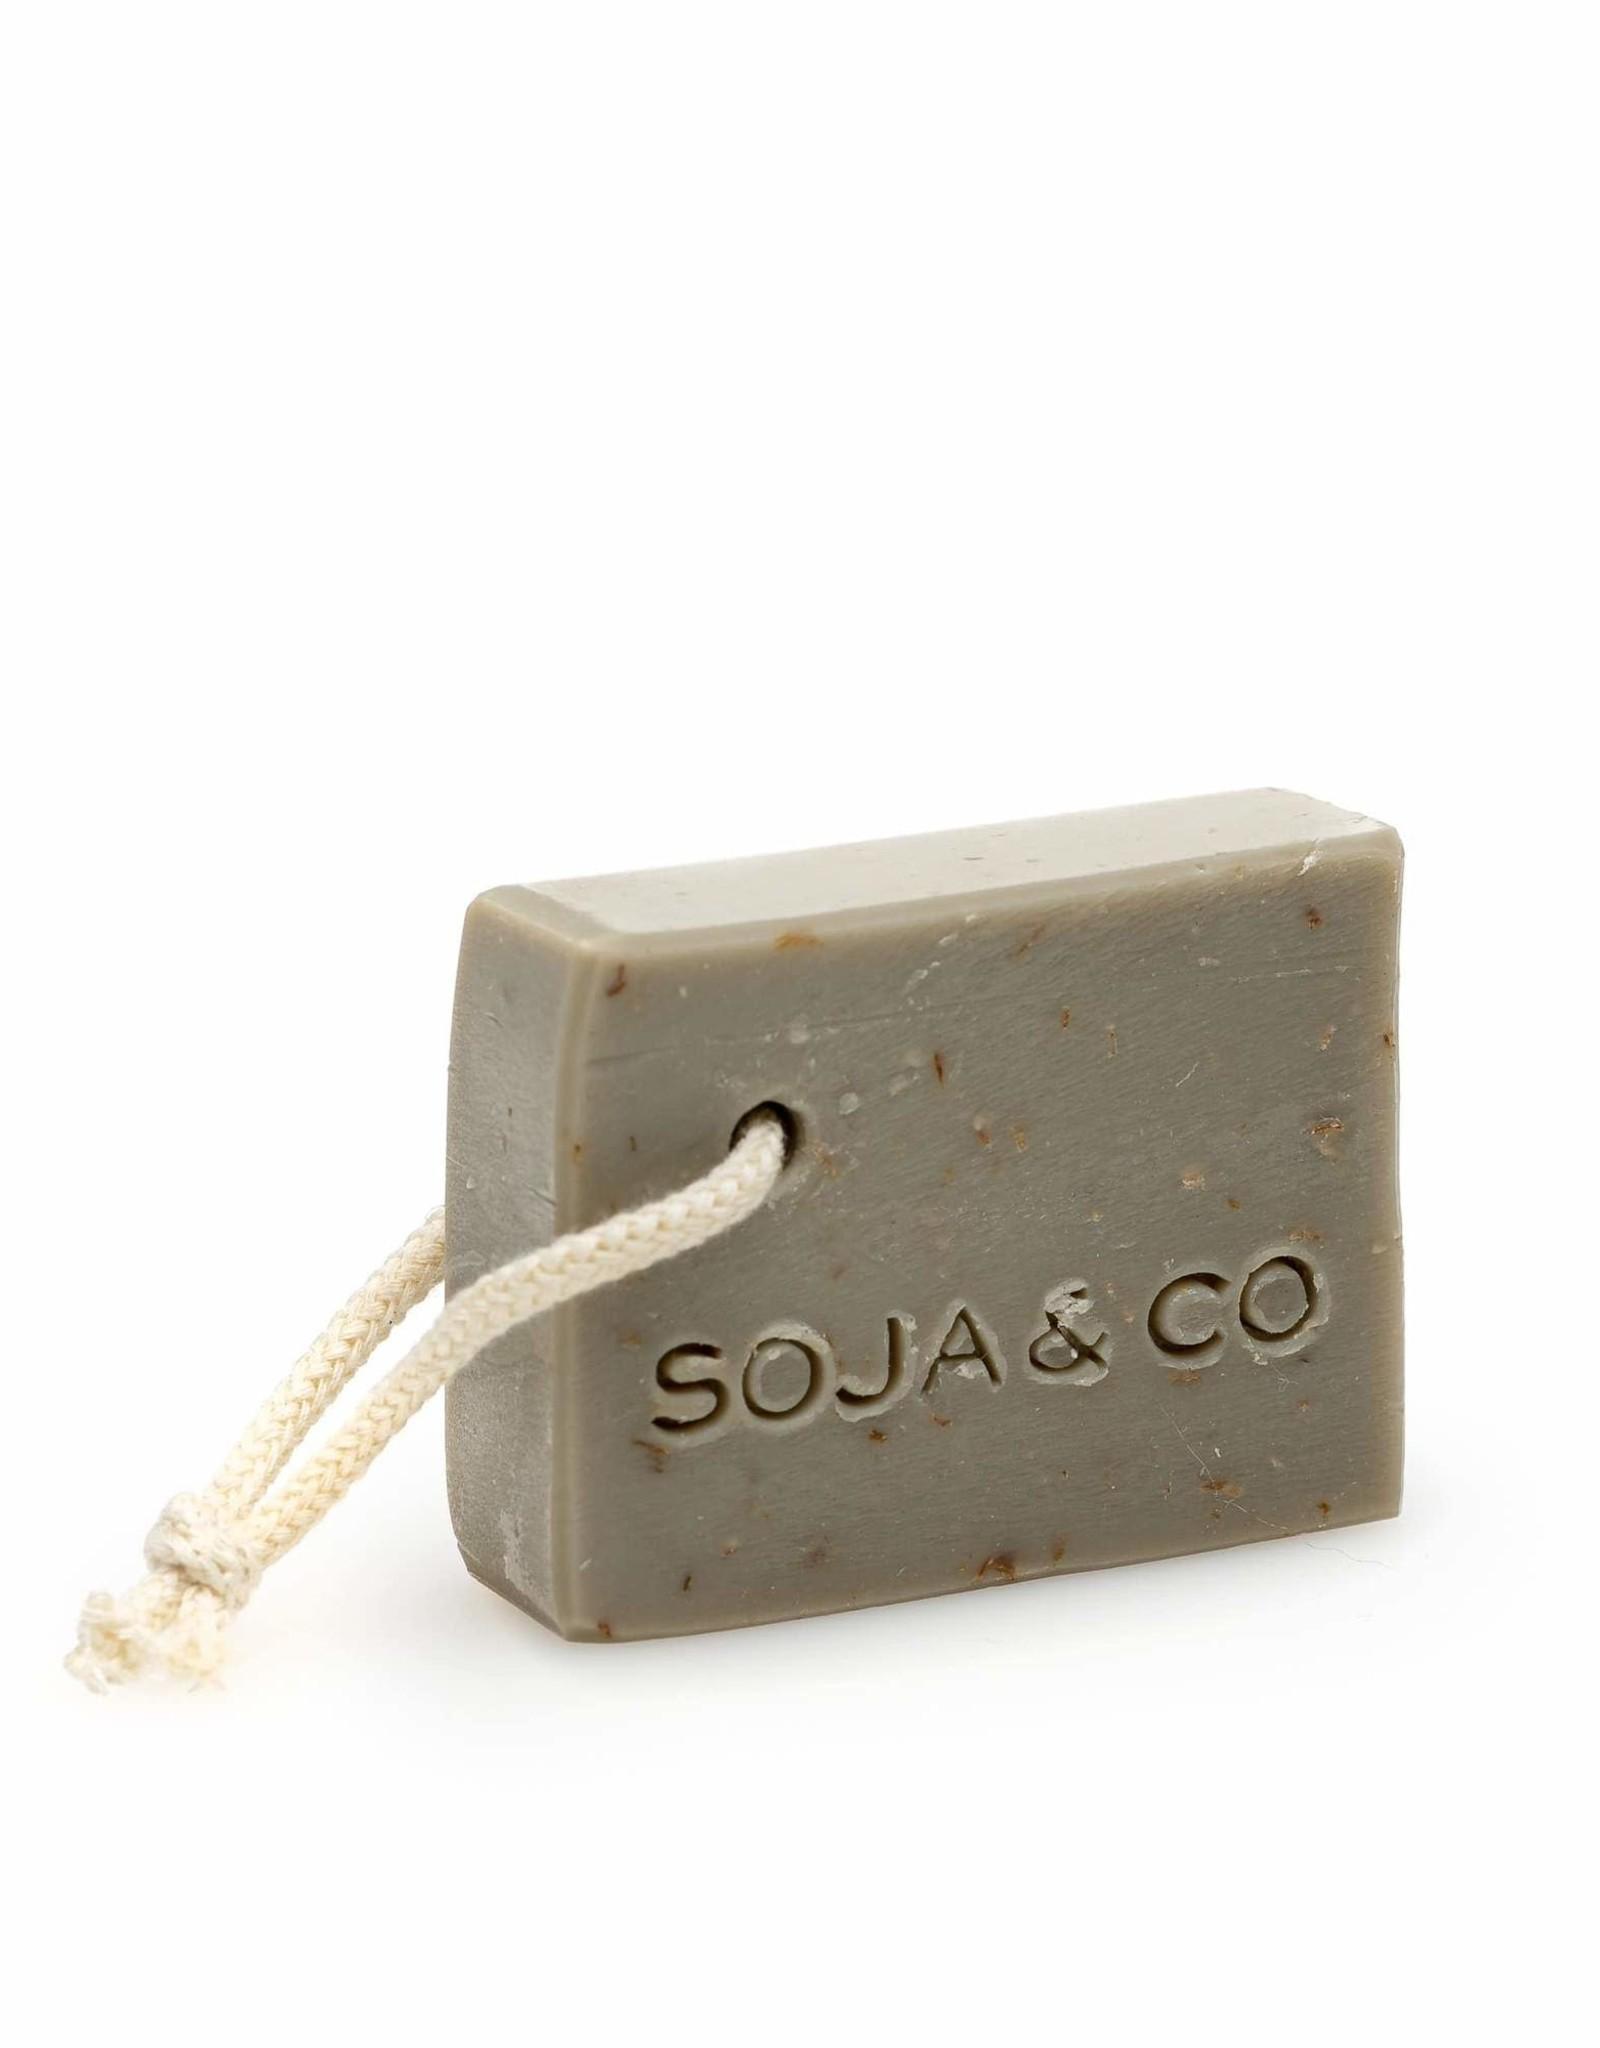 Soja&Co SAVON : SAUGE, EUCALYPTUS & LAVANDIN